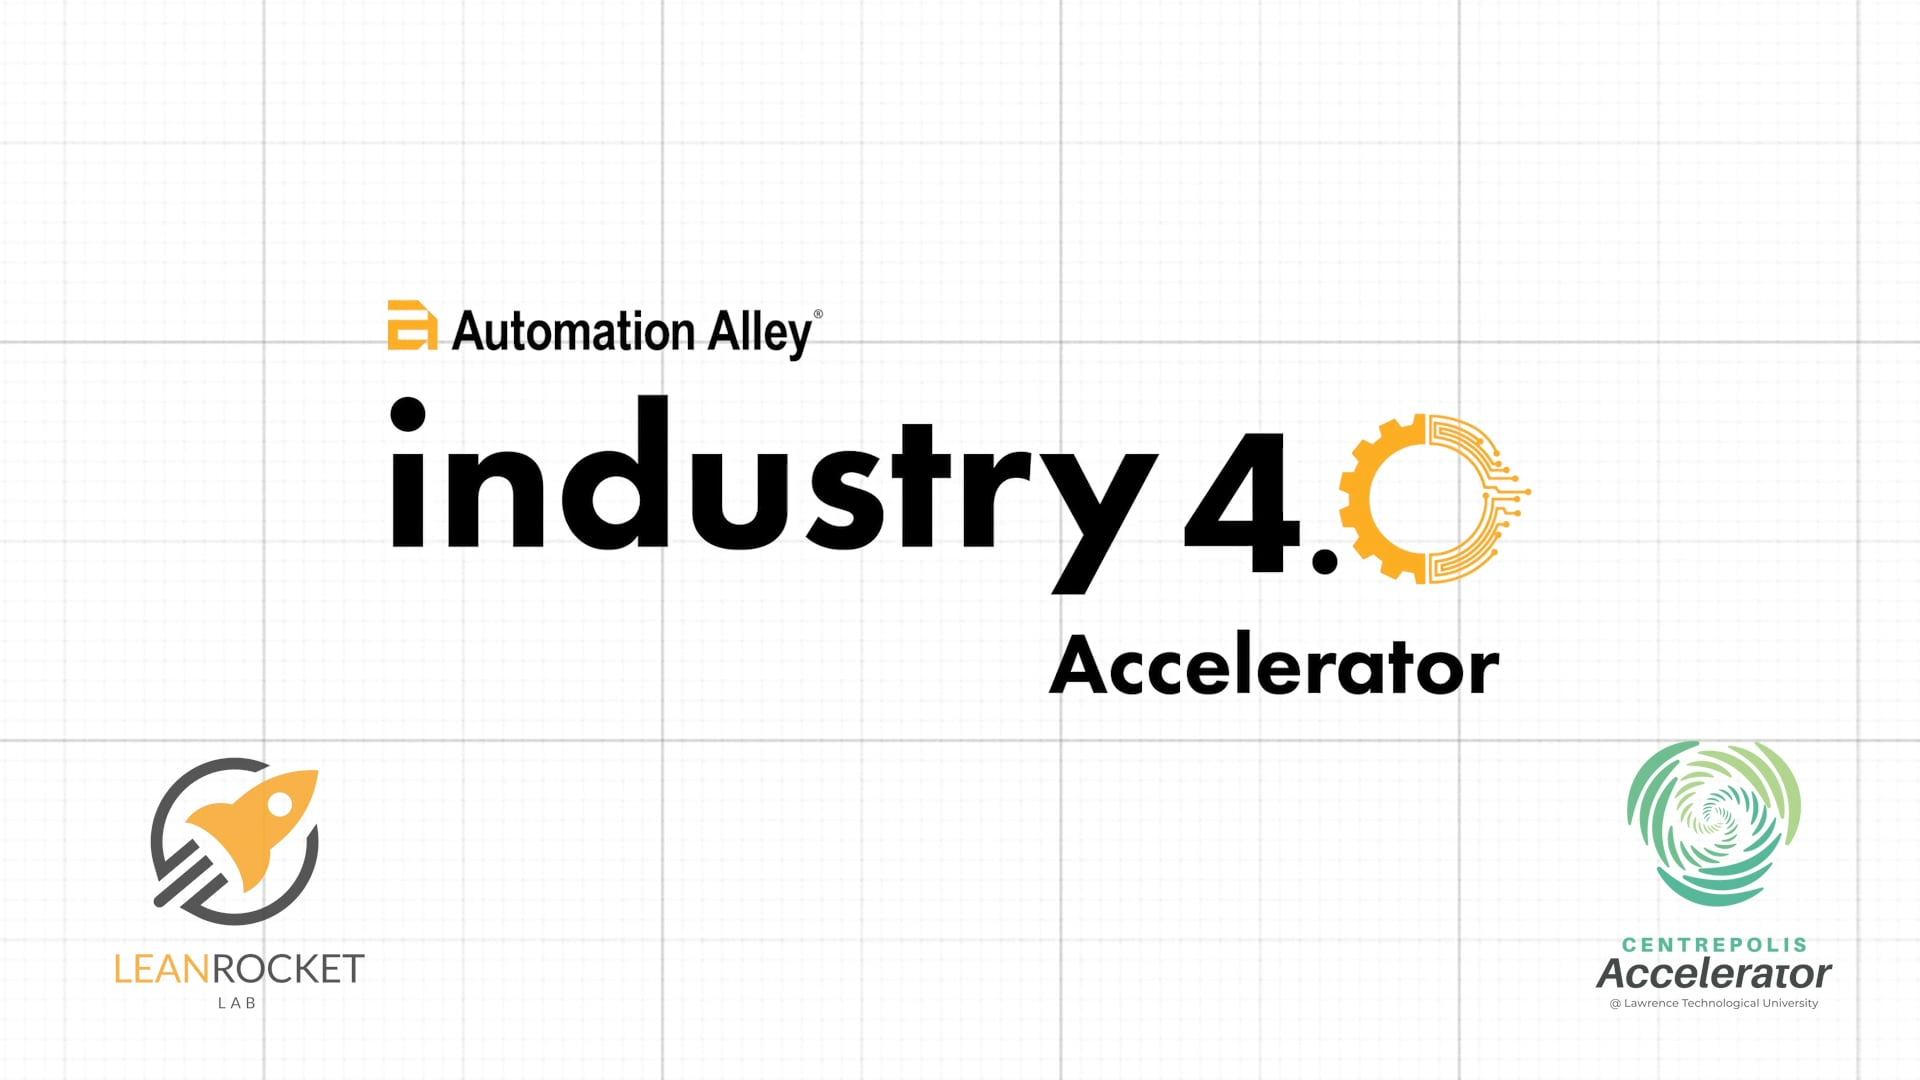 Industry 4.0 Accelerator